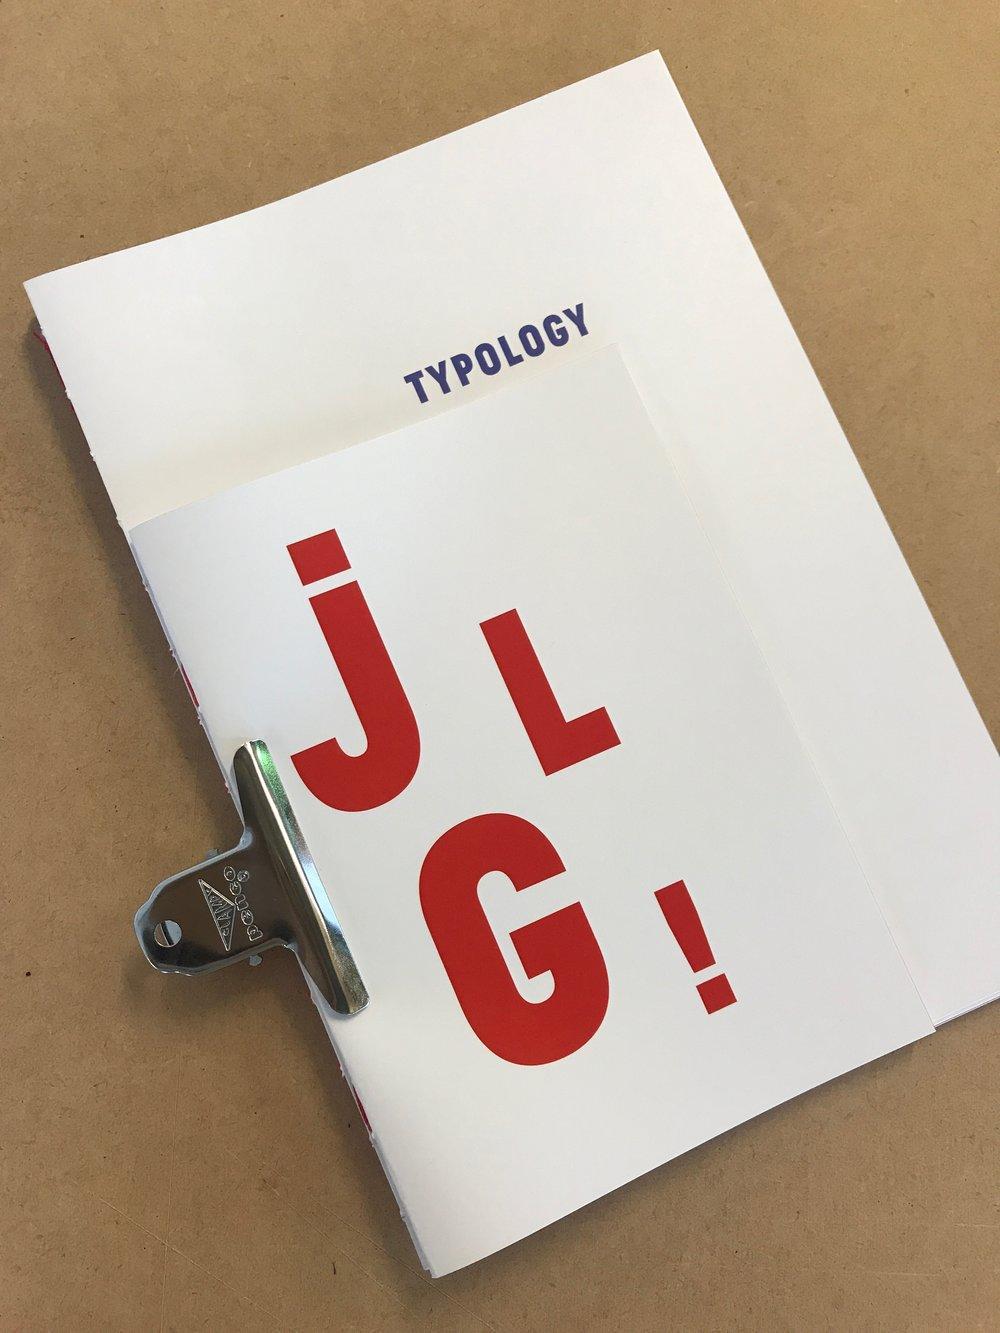 IMG-1480.JPG